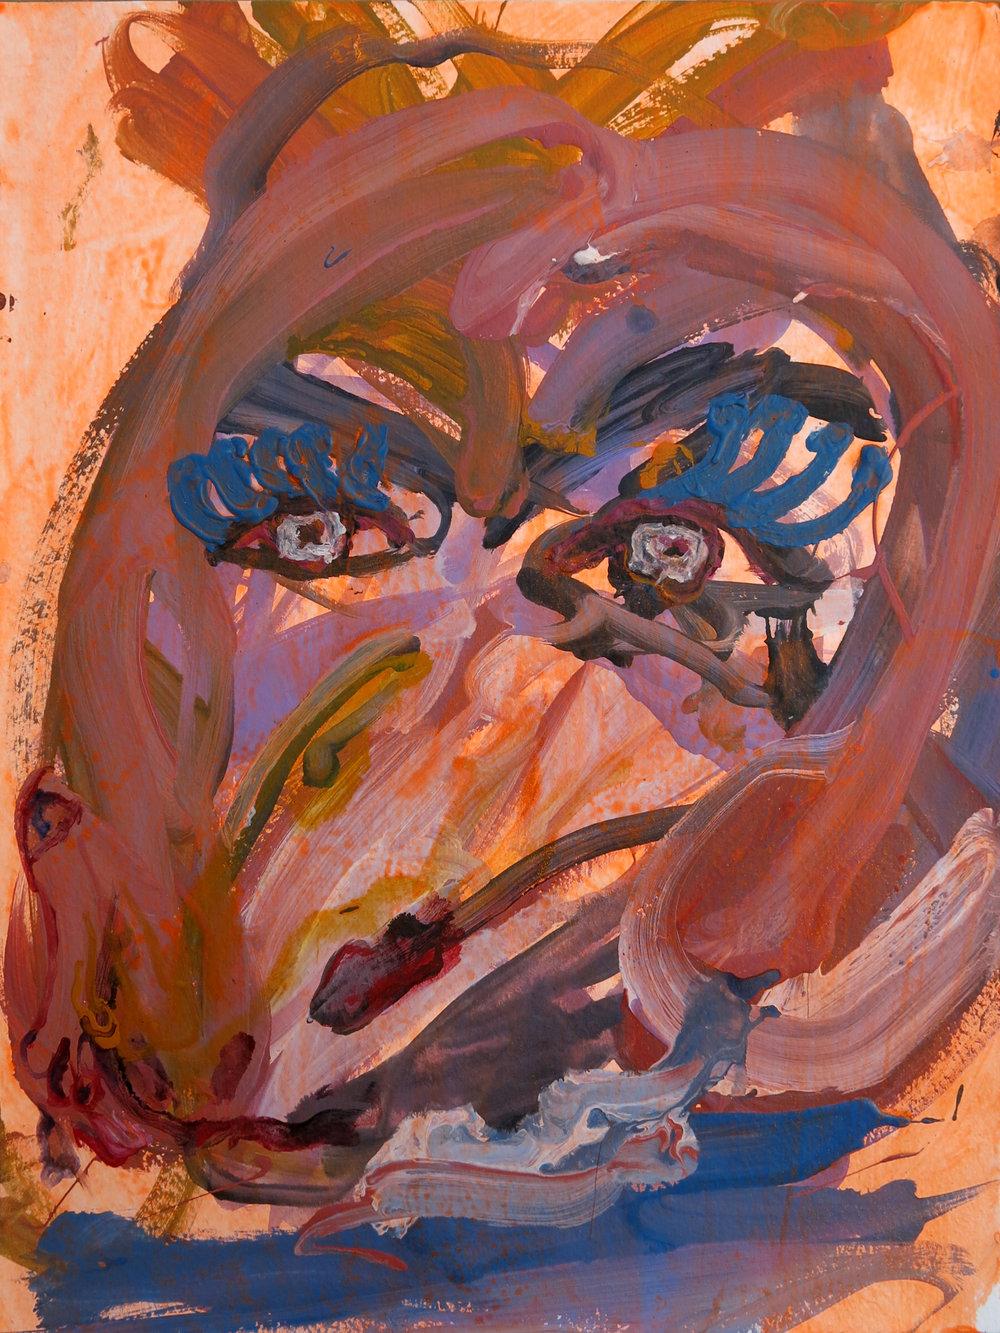 Barbra Streisand Portrait #159